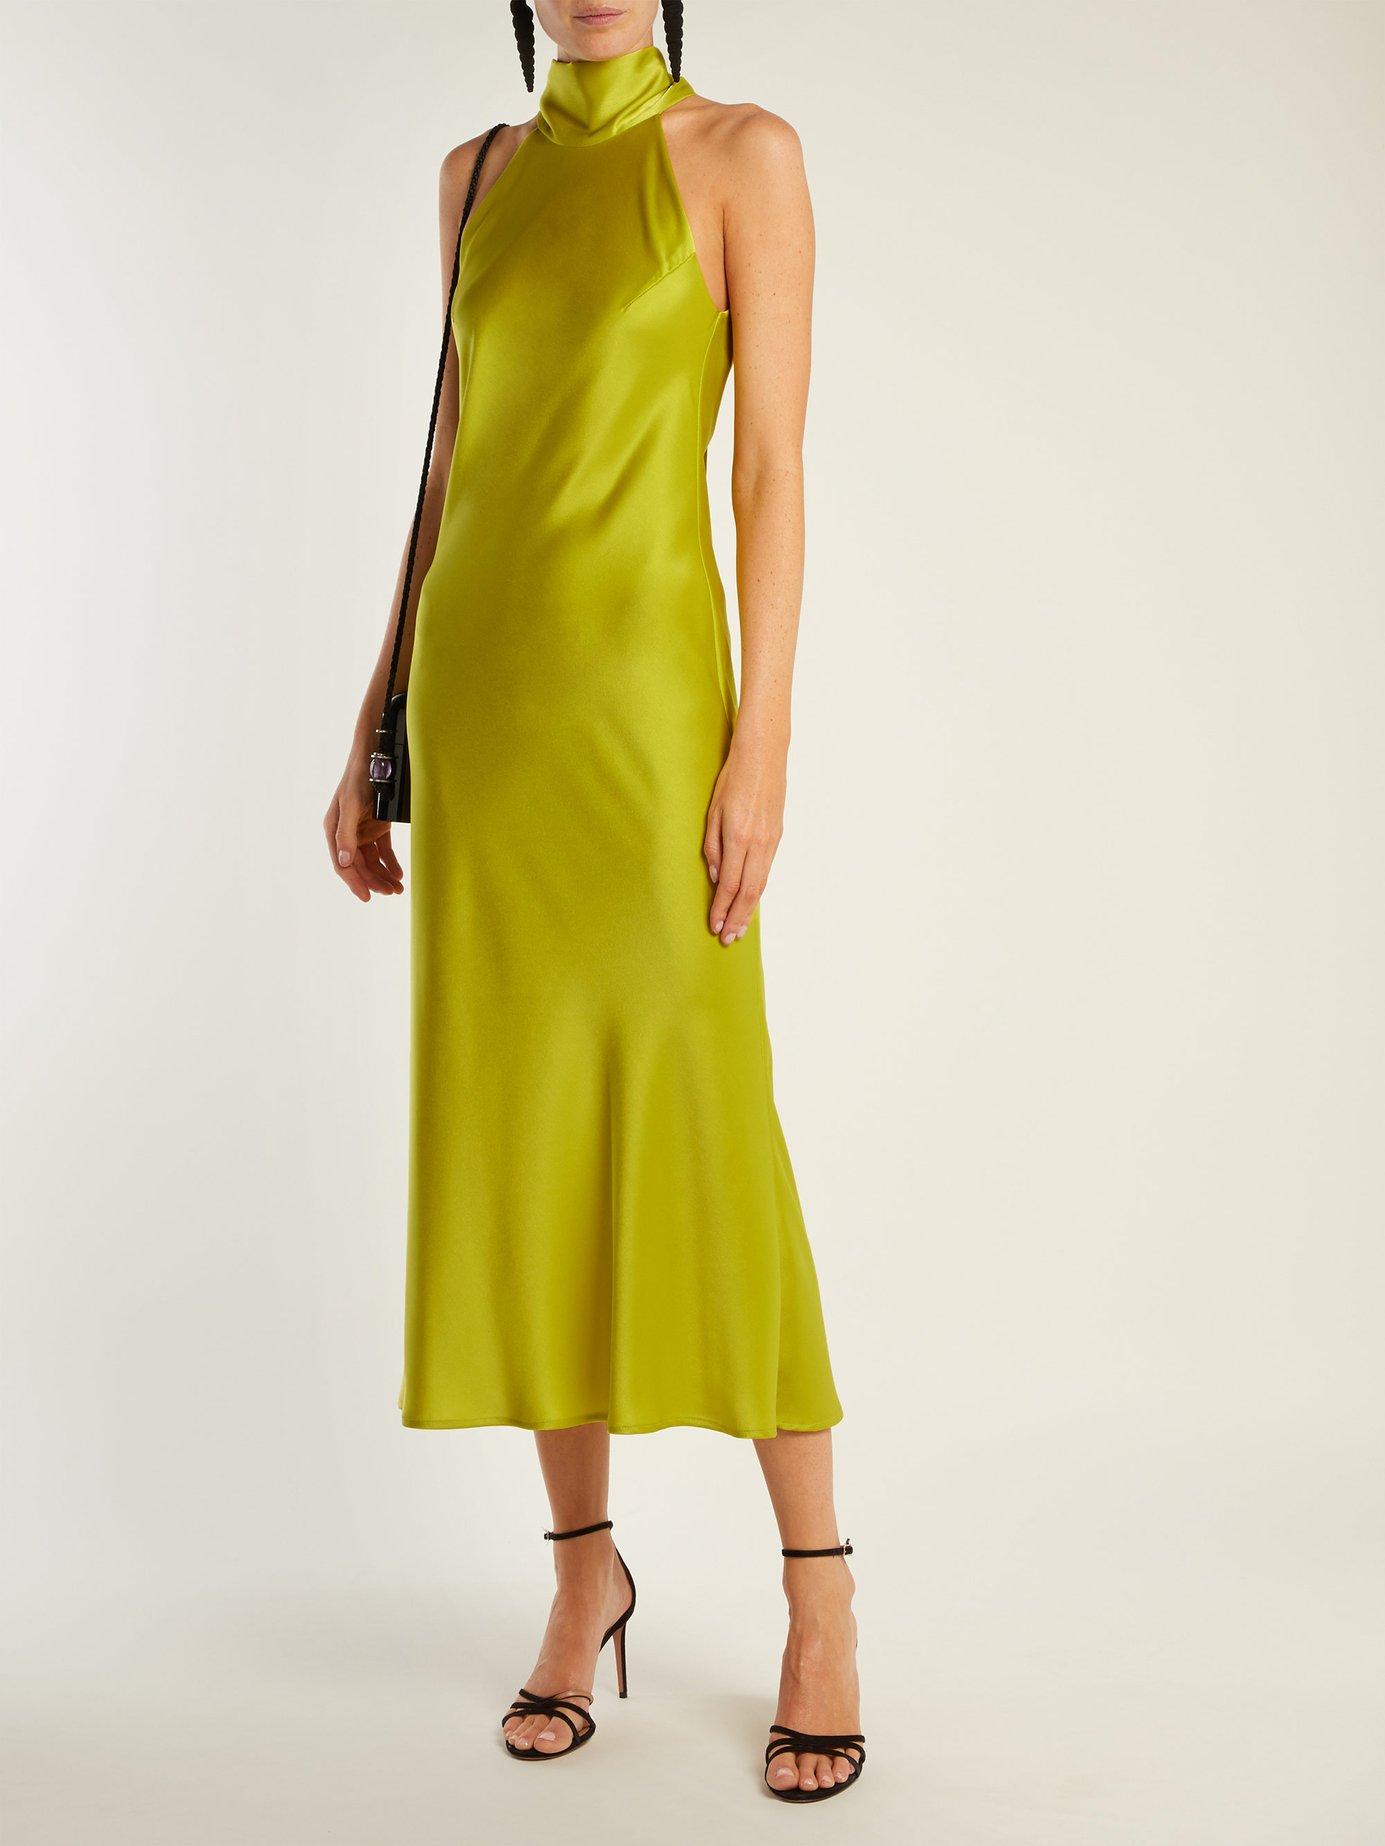 Sienna bias-cut satin dress by Galvan